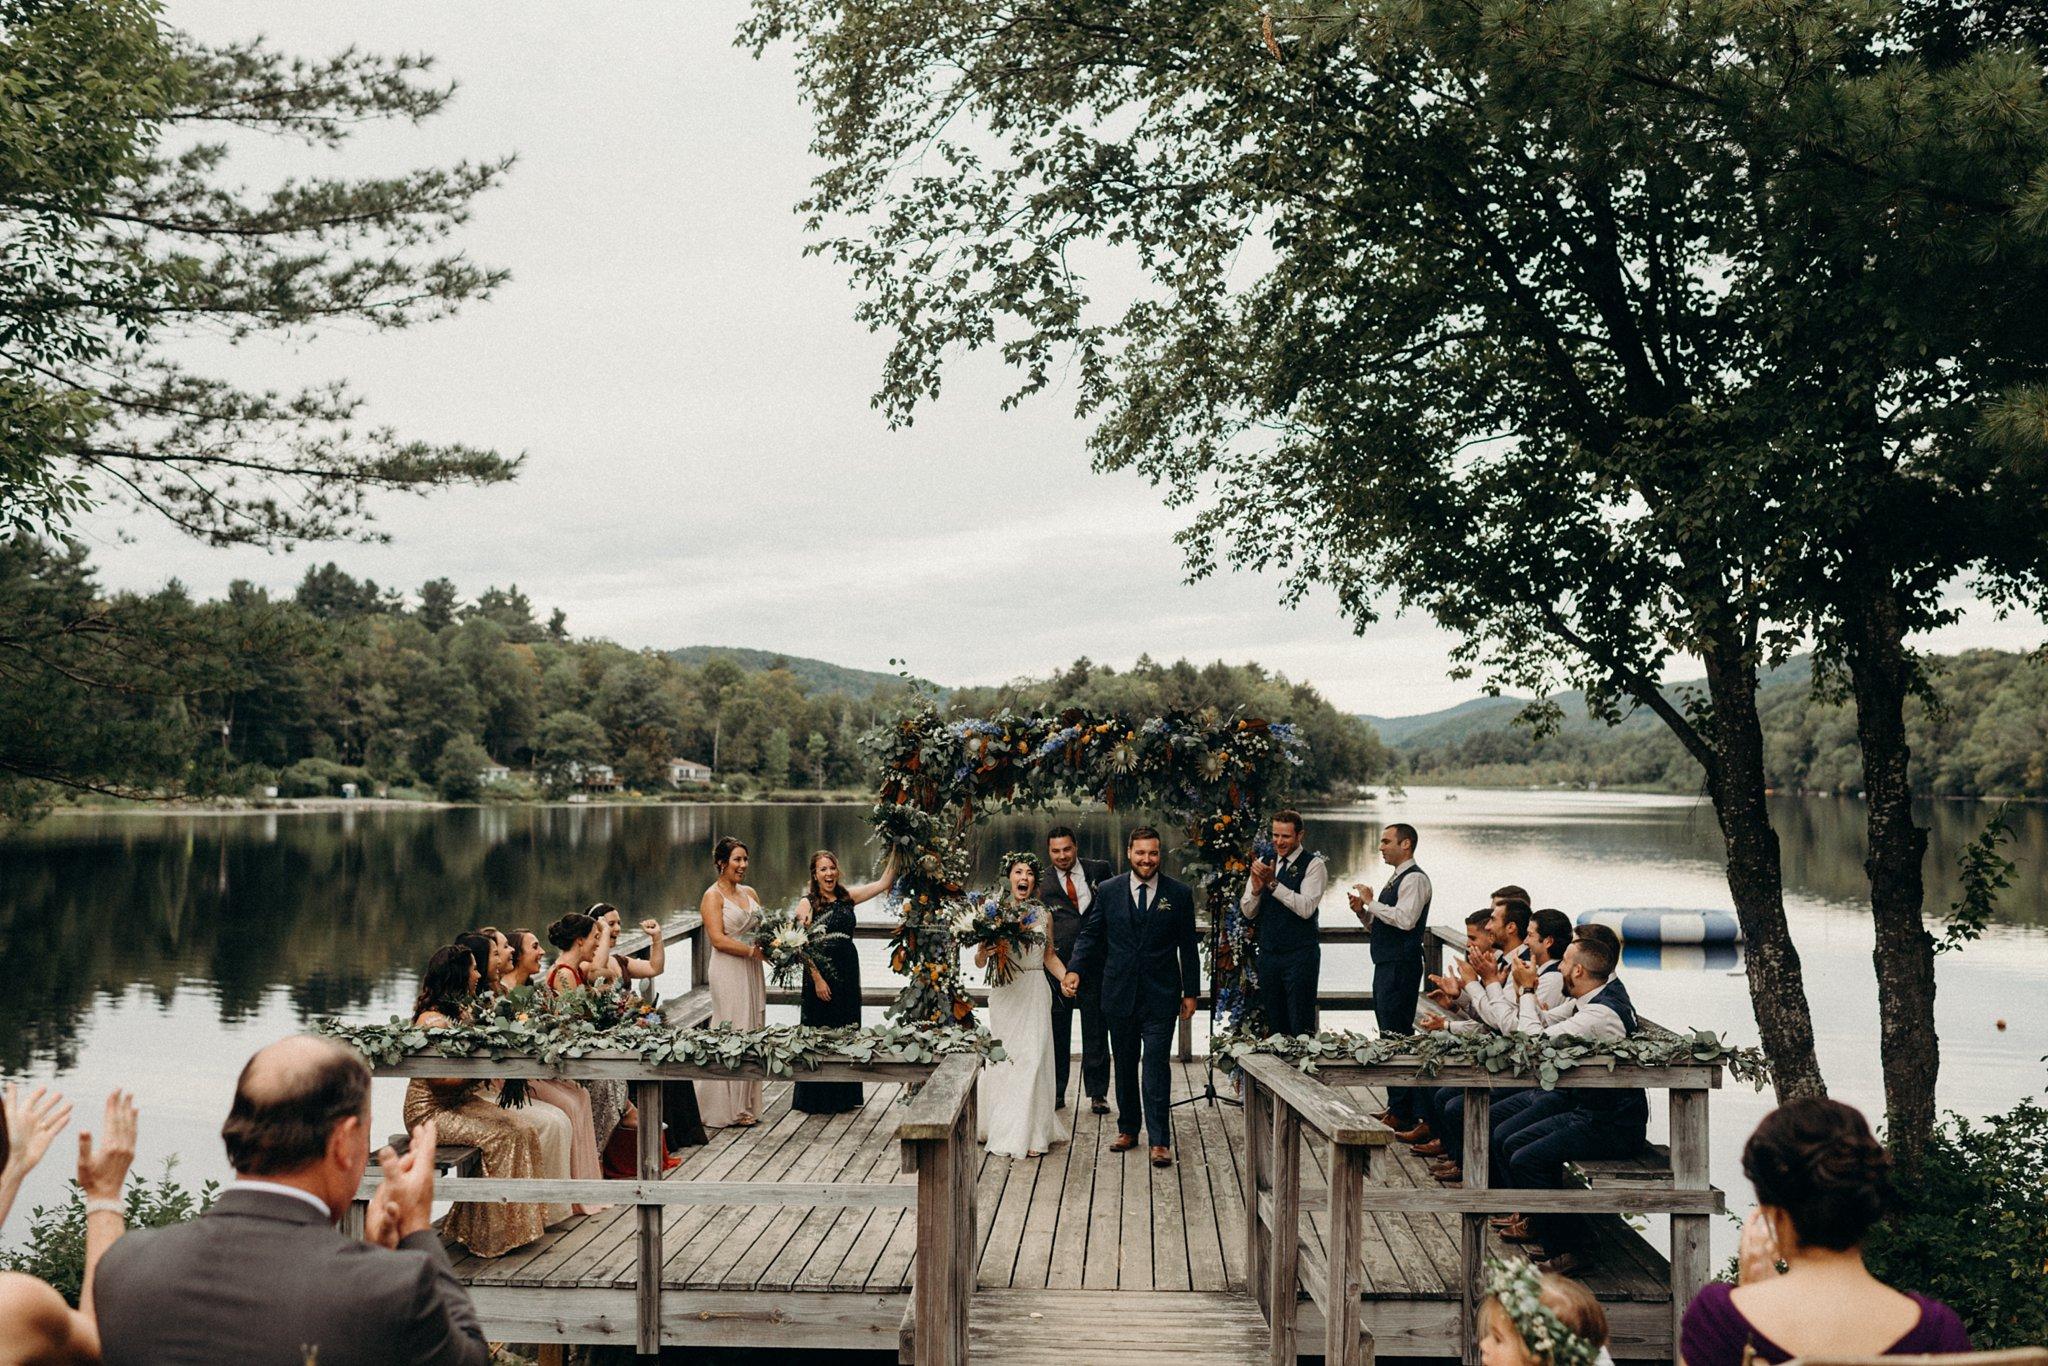 kaihla_tonai_intimate_wedding_elopement_photographer_6648.jpg